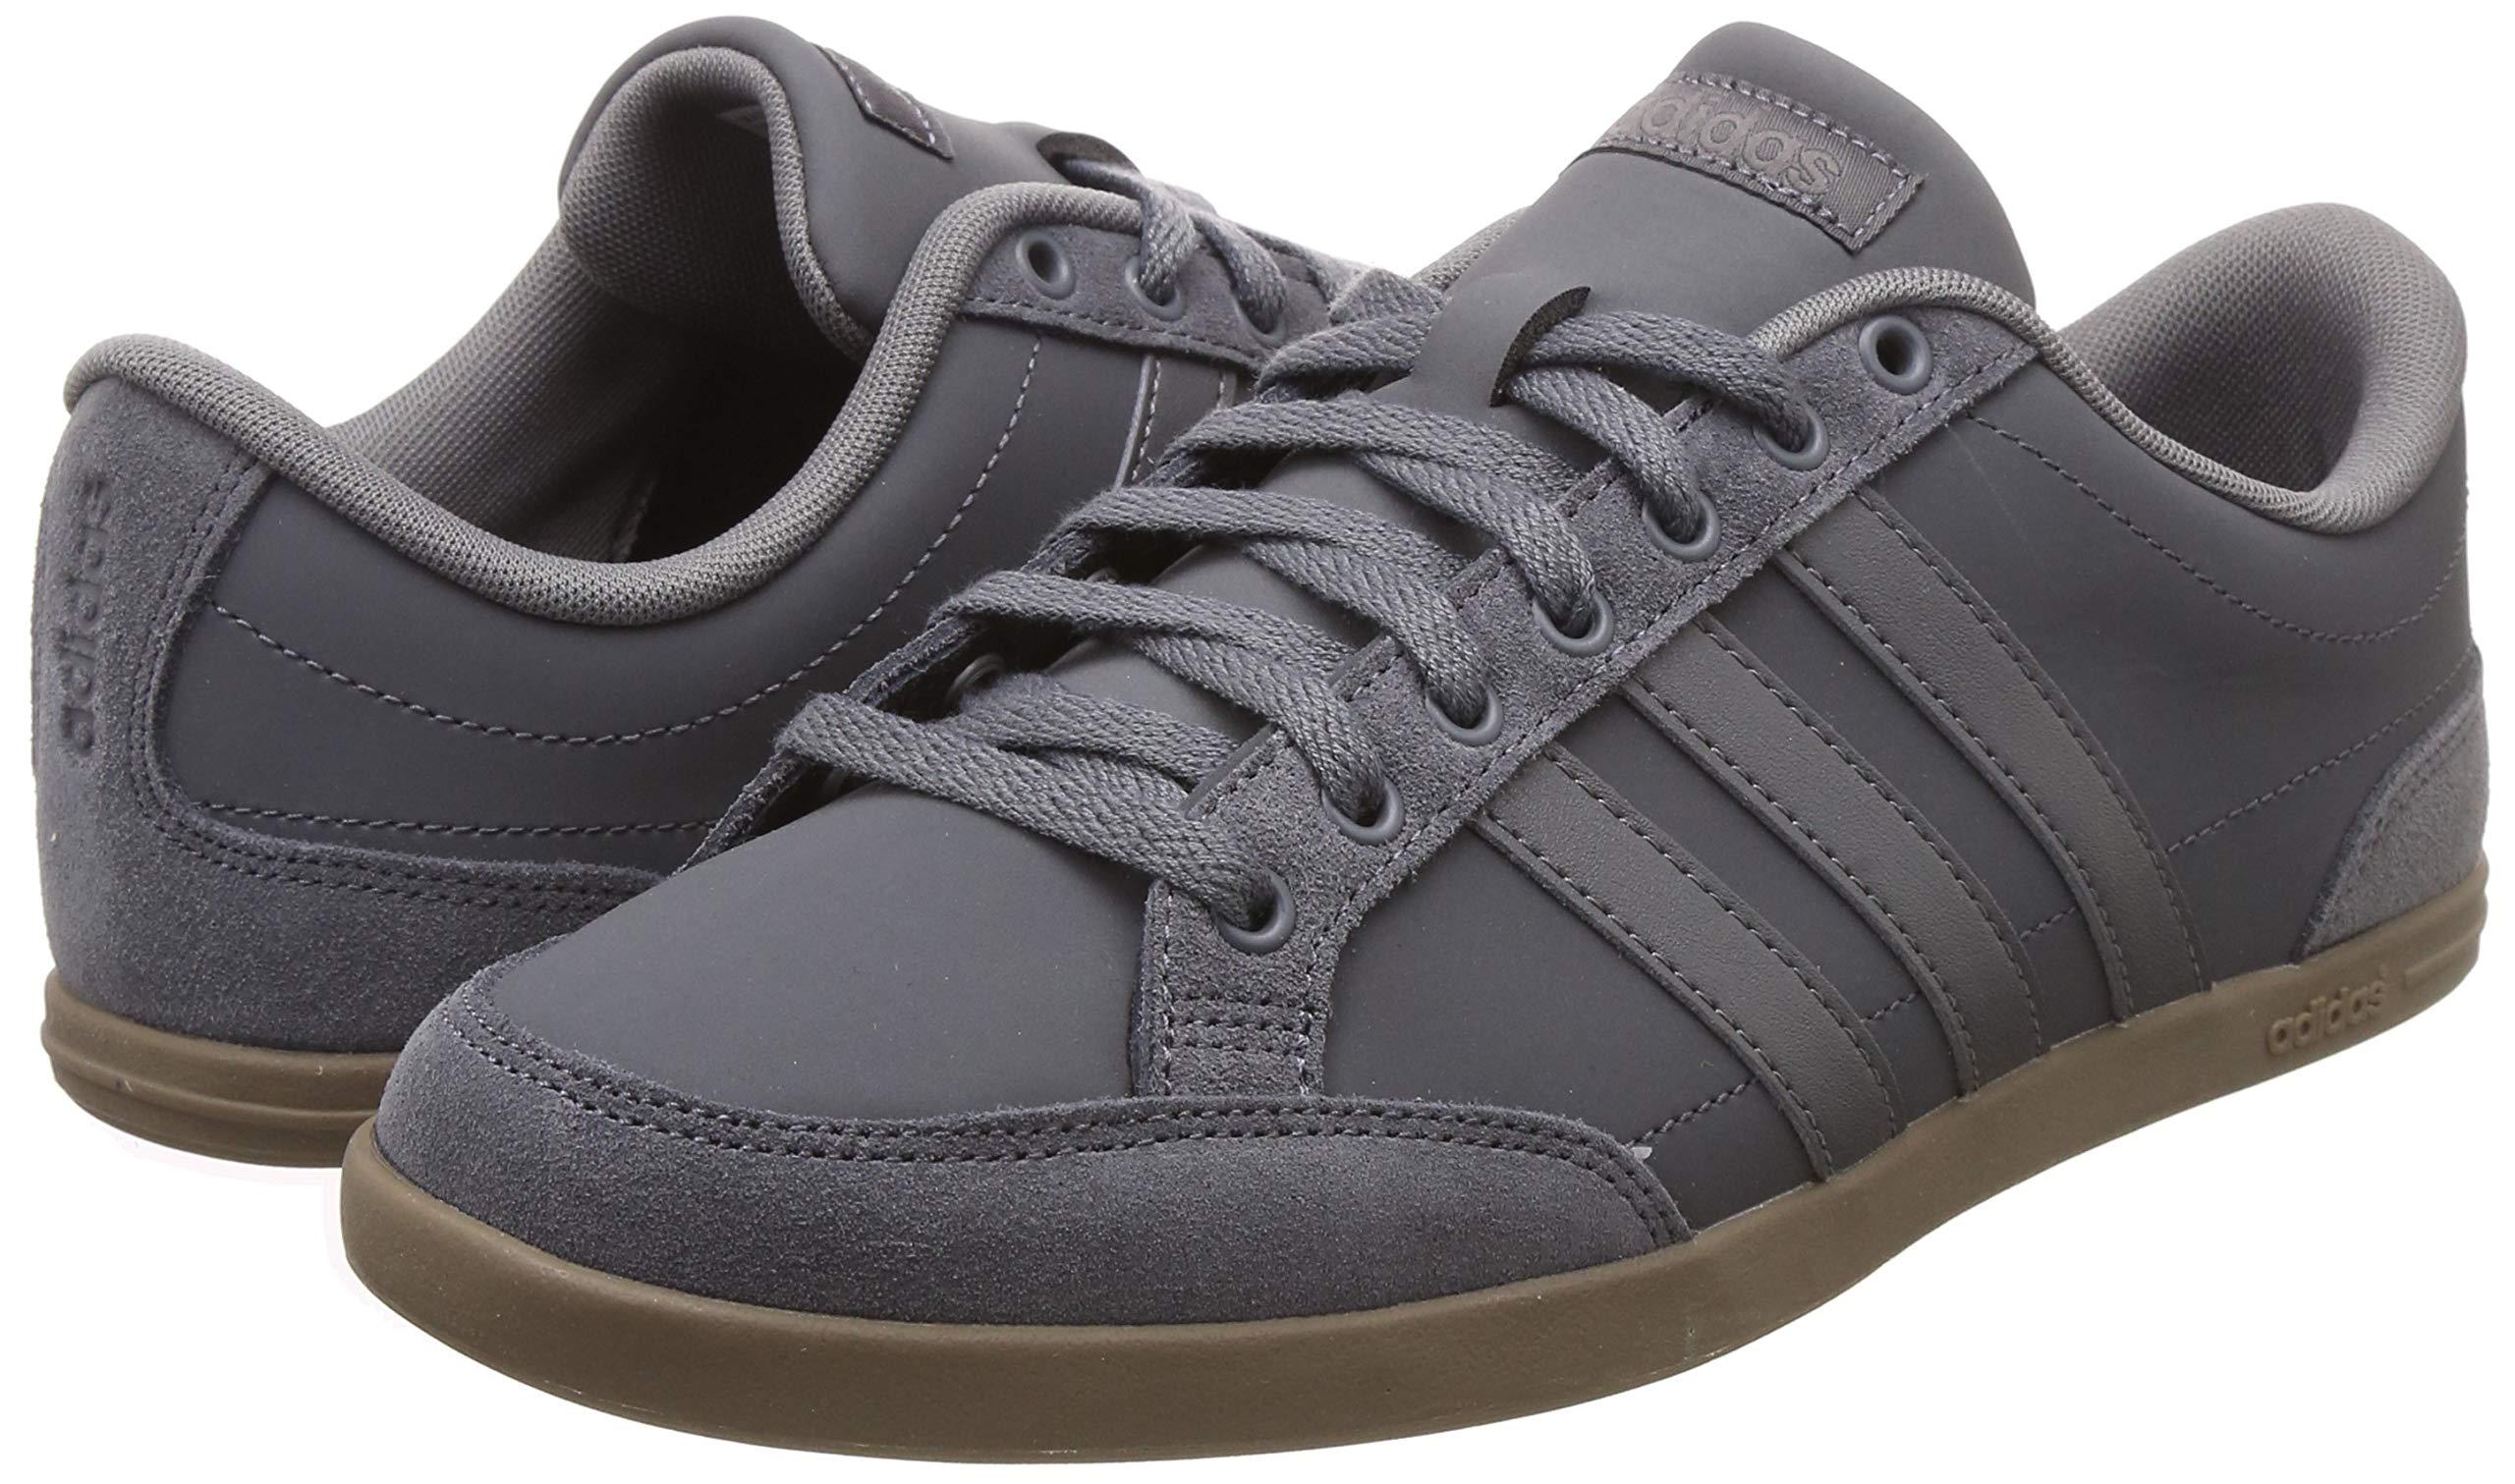 Desgastar Perfecto partícipe  adidas Men's Caflaire Tennis Shoes- Buy Online in Bahamas at  bahamas.desertcart.com. ProductId : 77039617.